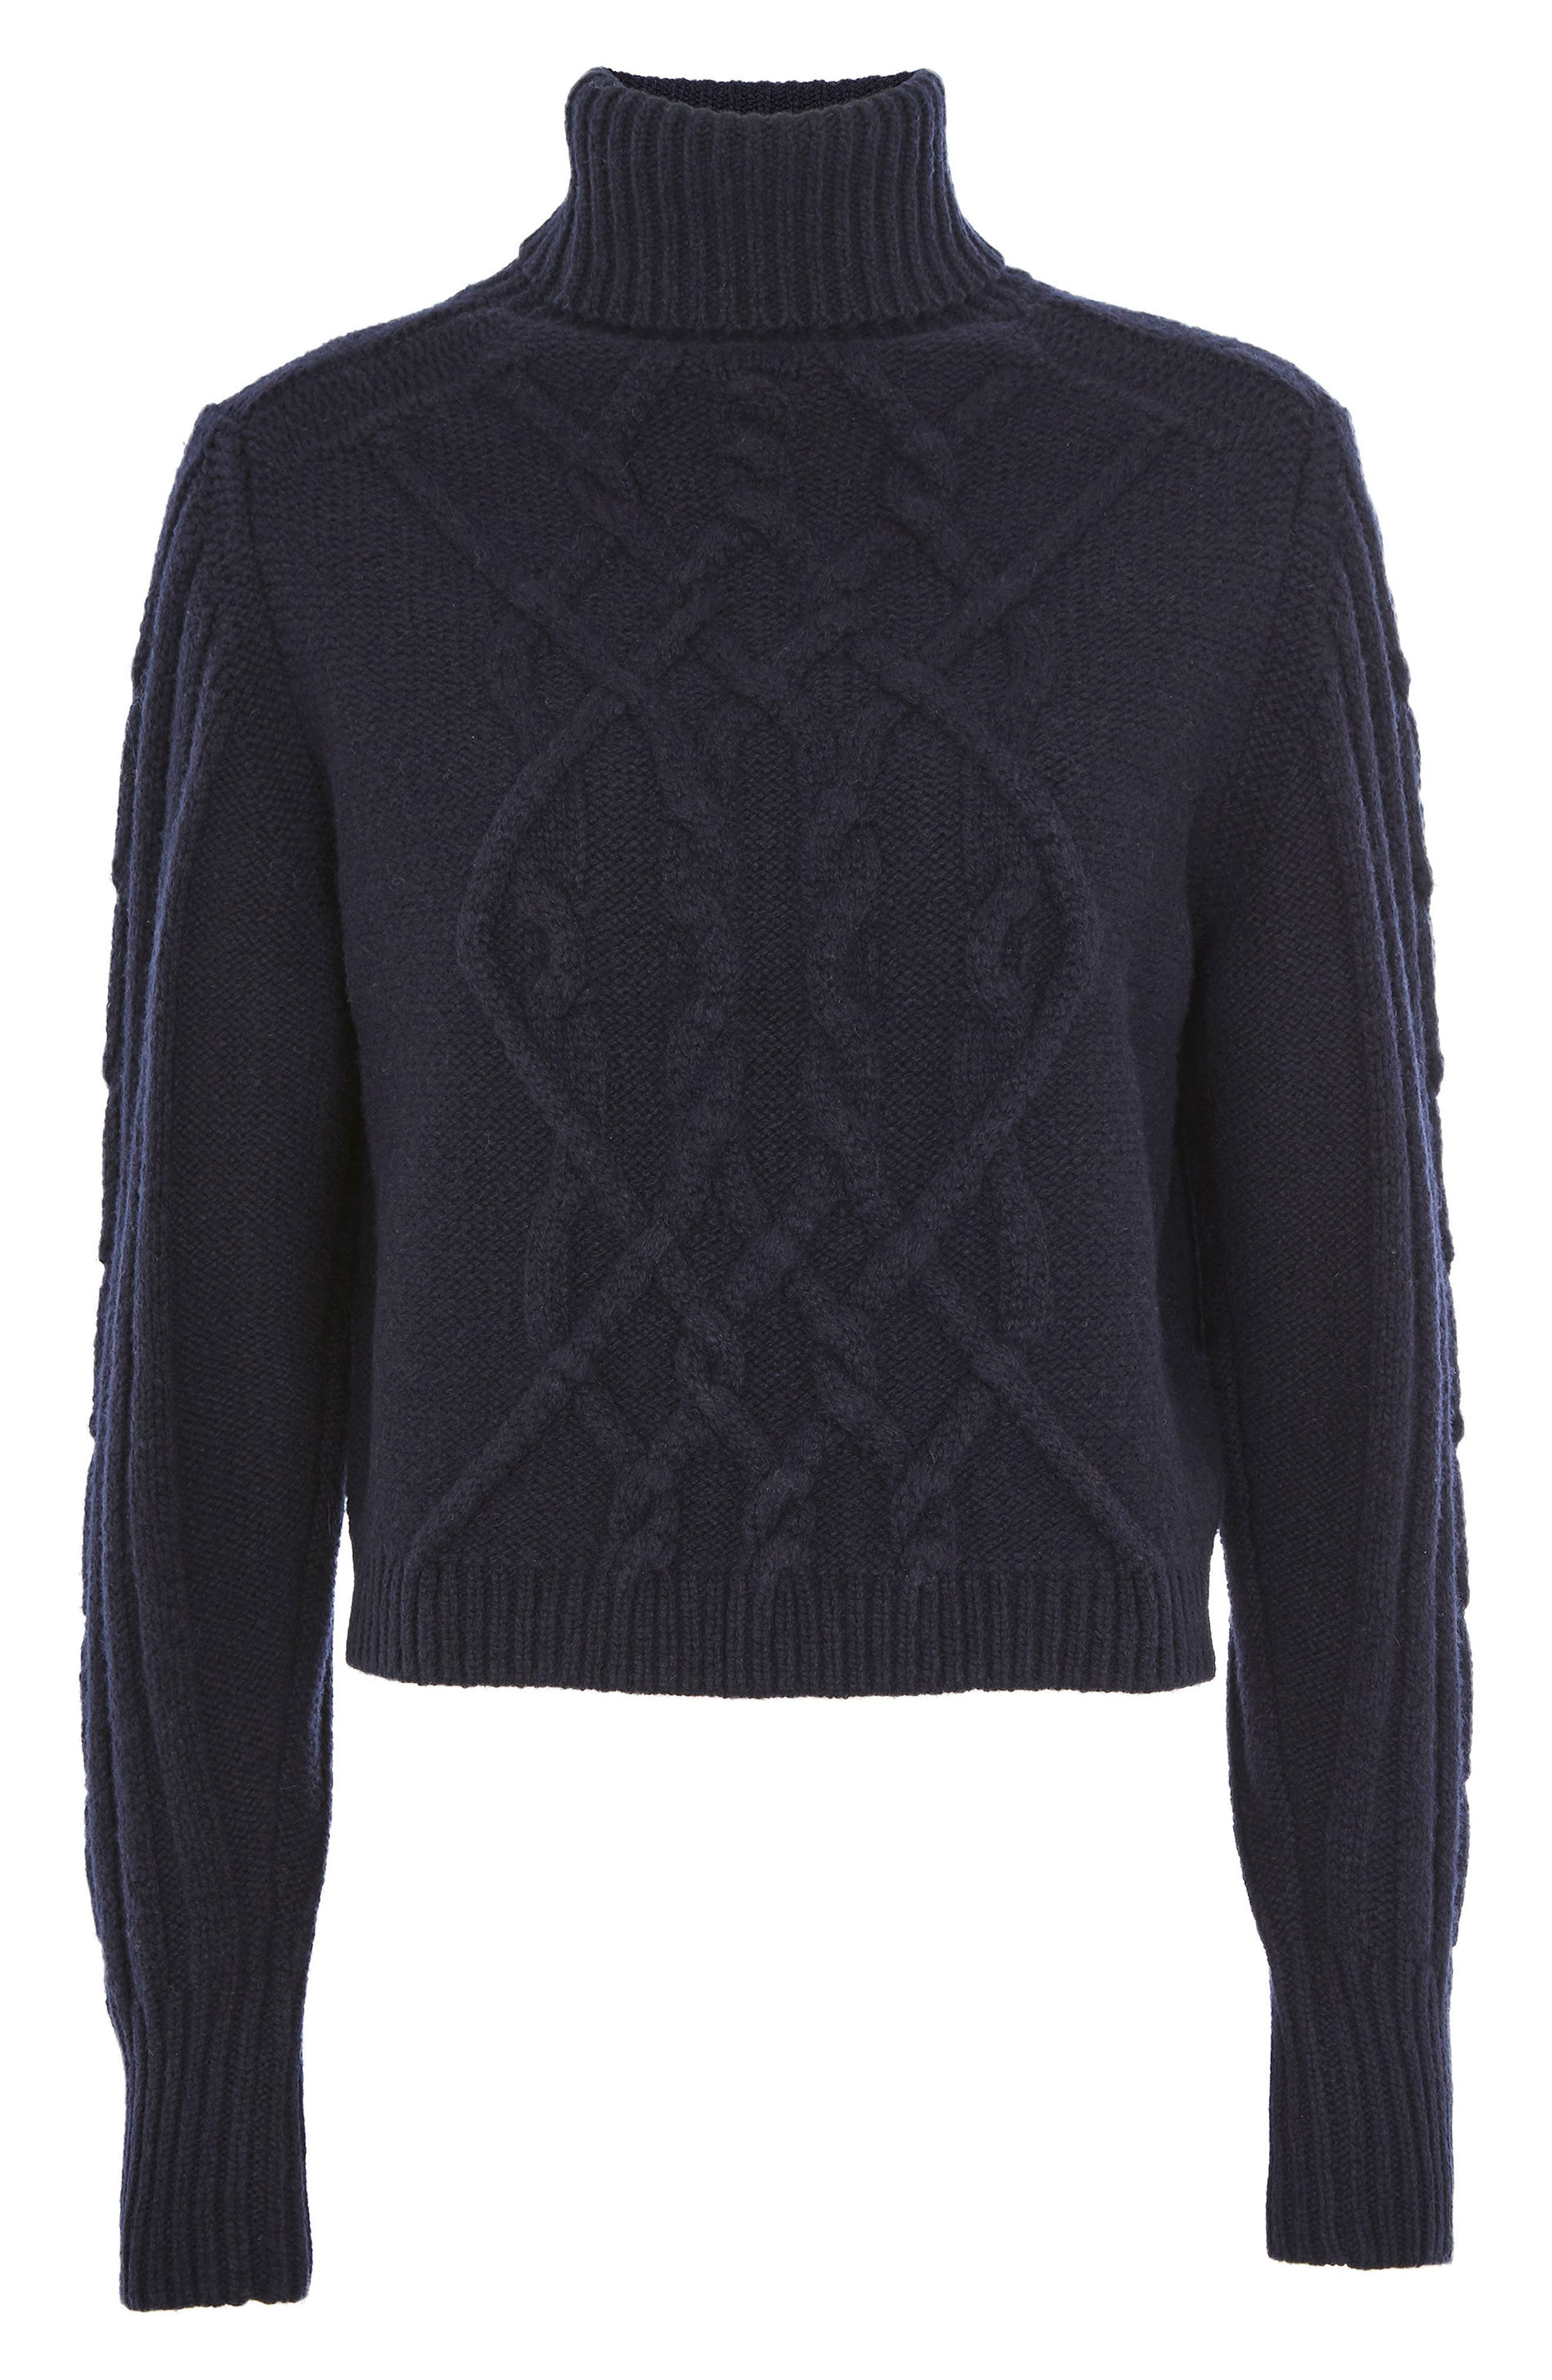 Cable Knit Turtleneck Sweater,                             Alternate thumbnail 2, color,